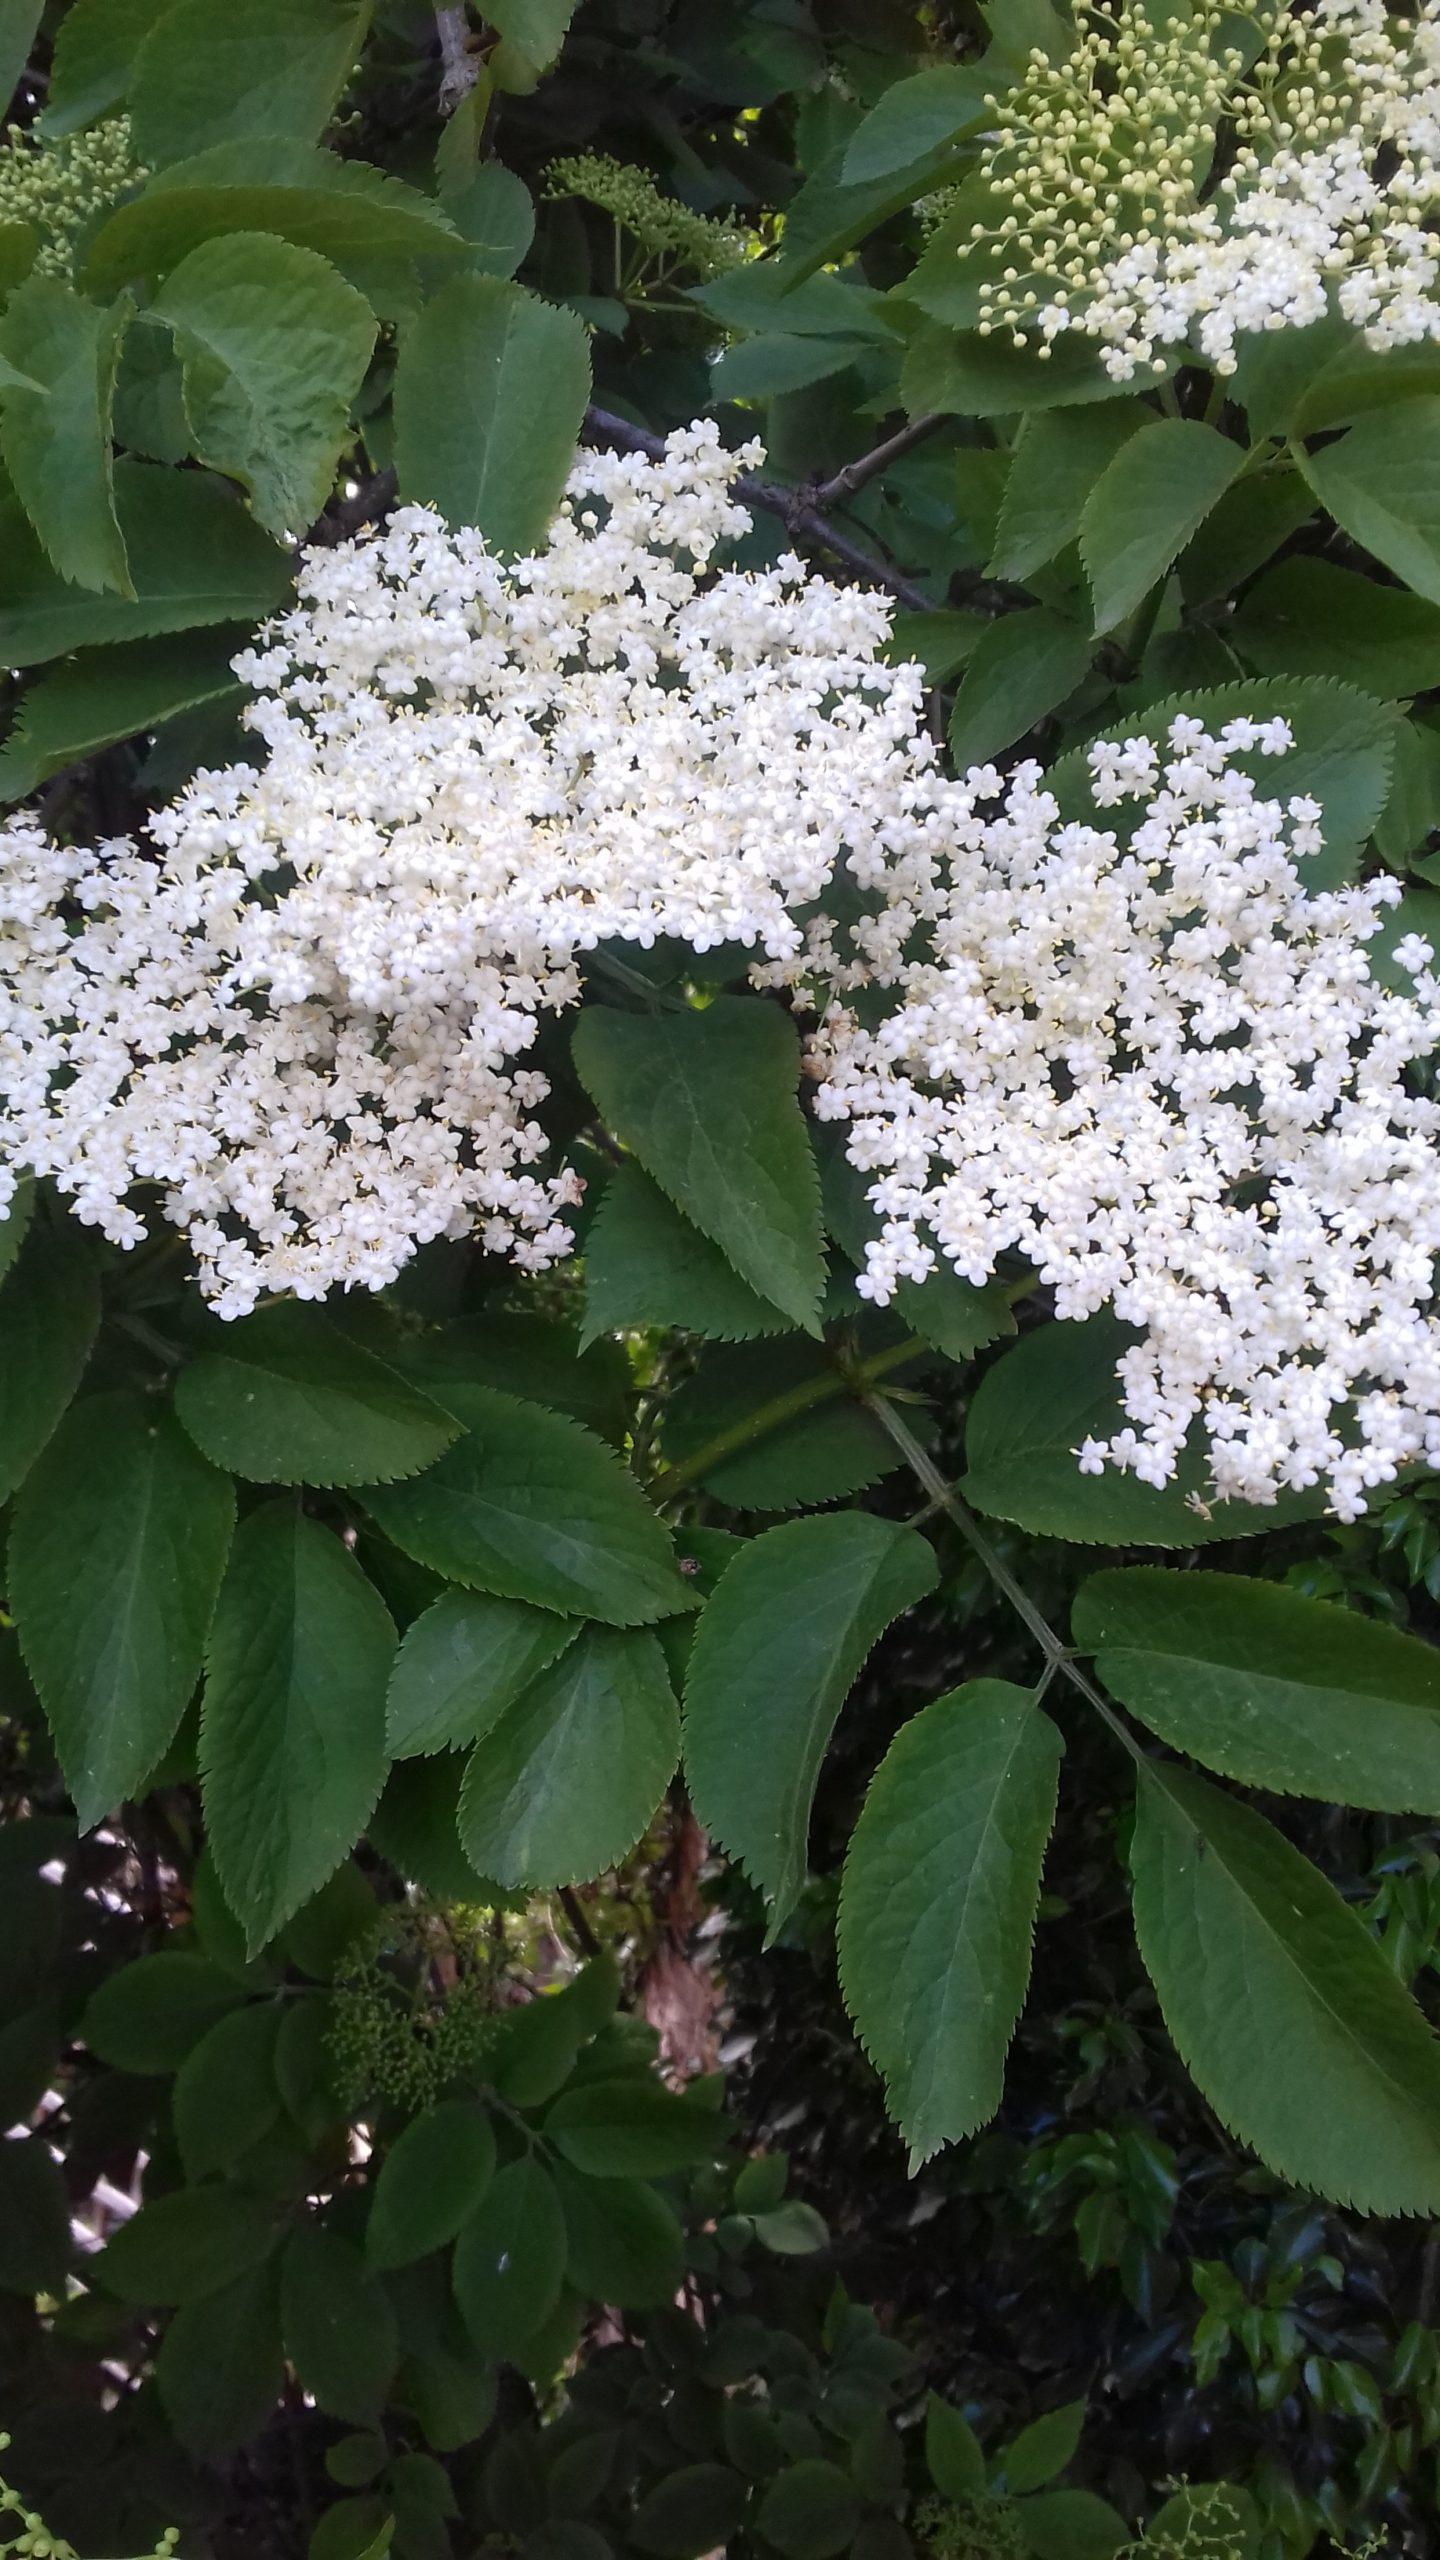 elderflower cordial recipe, how to make, summer recipes, elderflower, easy, best